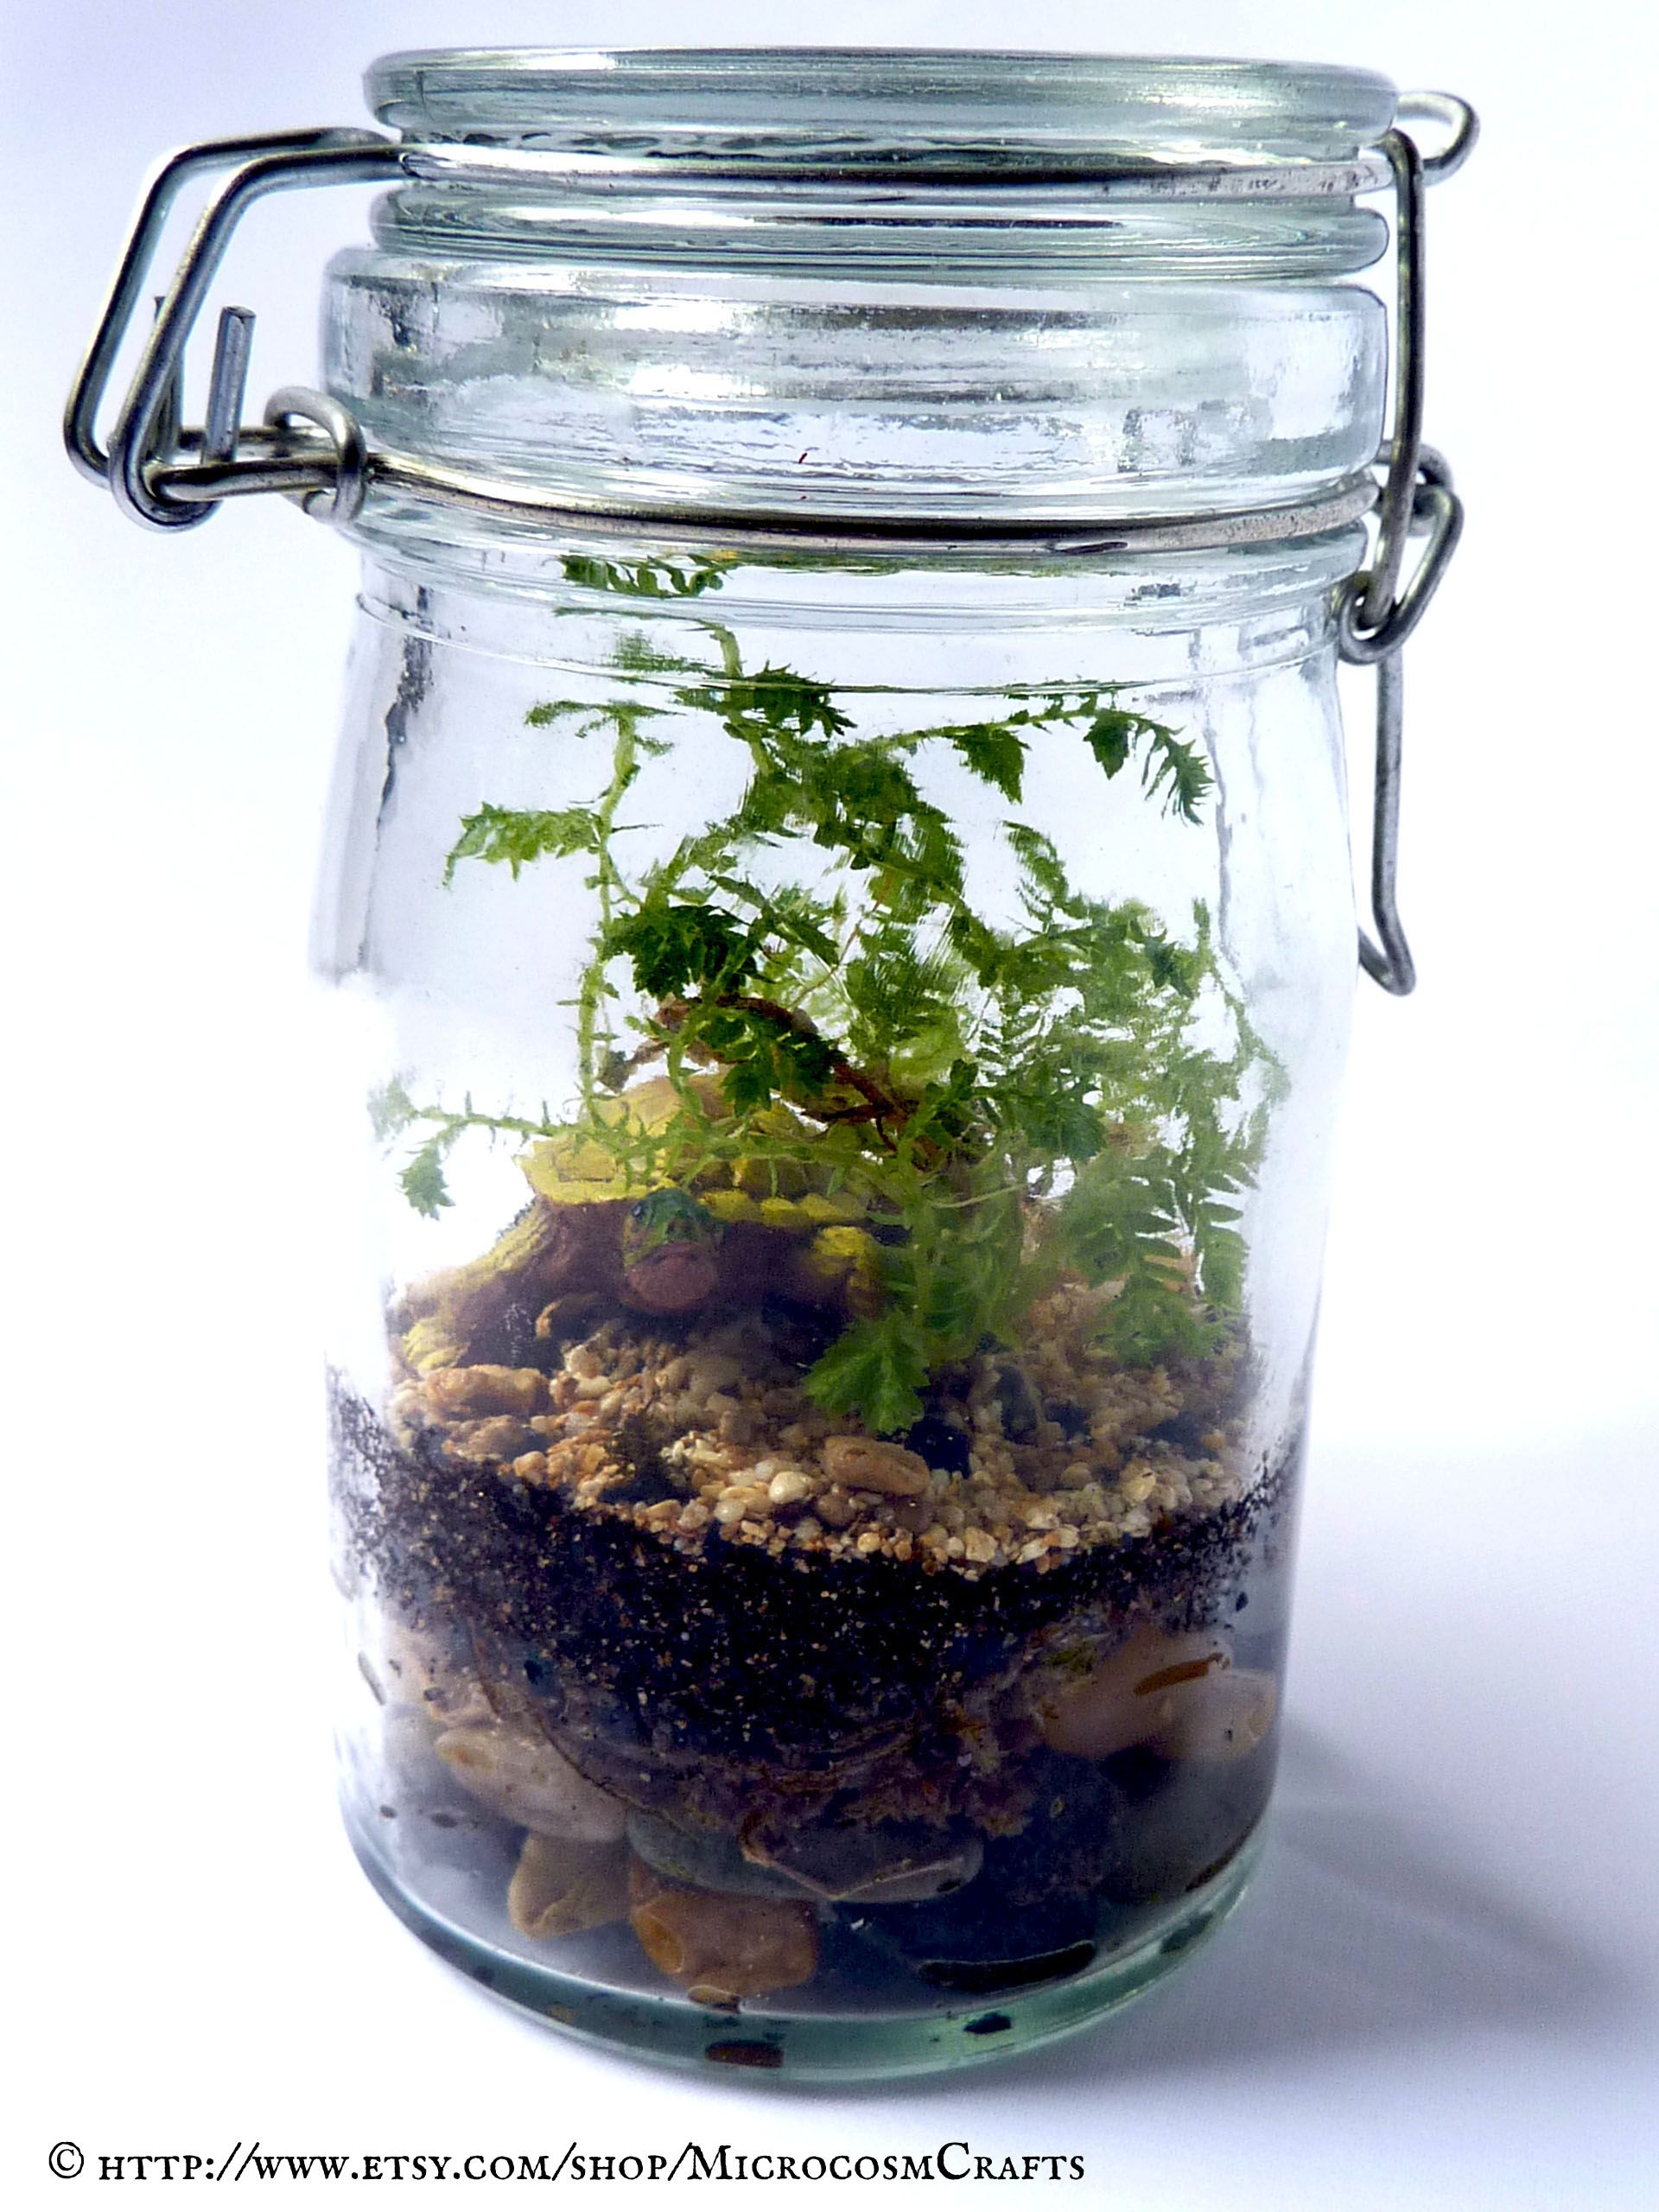 Club moss selaginella canning jar glass terrarium with desert